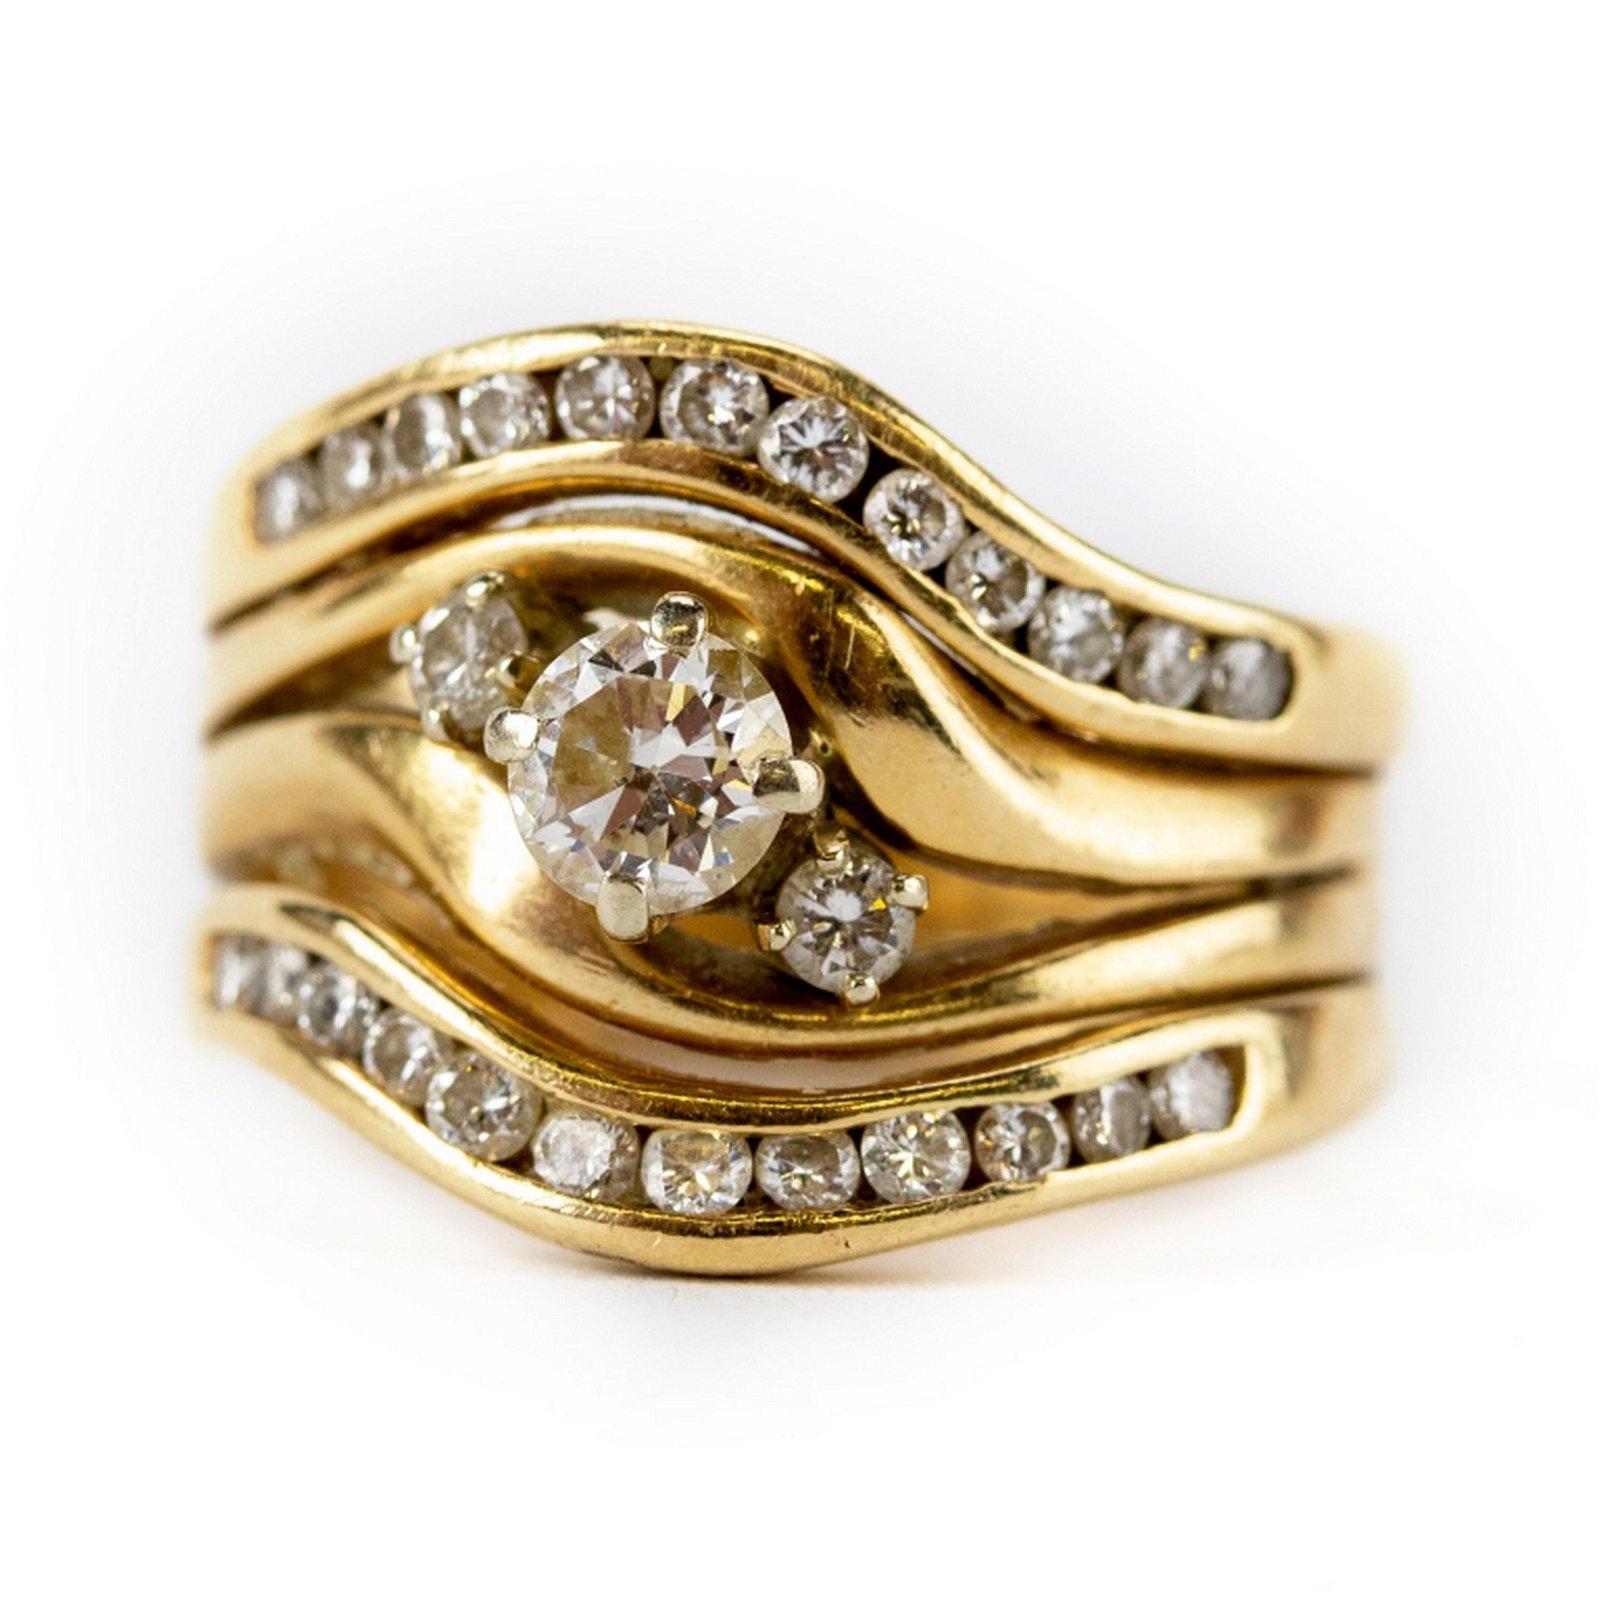 14k Gold 4/5 CTTW Ladies Diamond Cocktail Ring